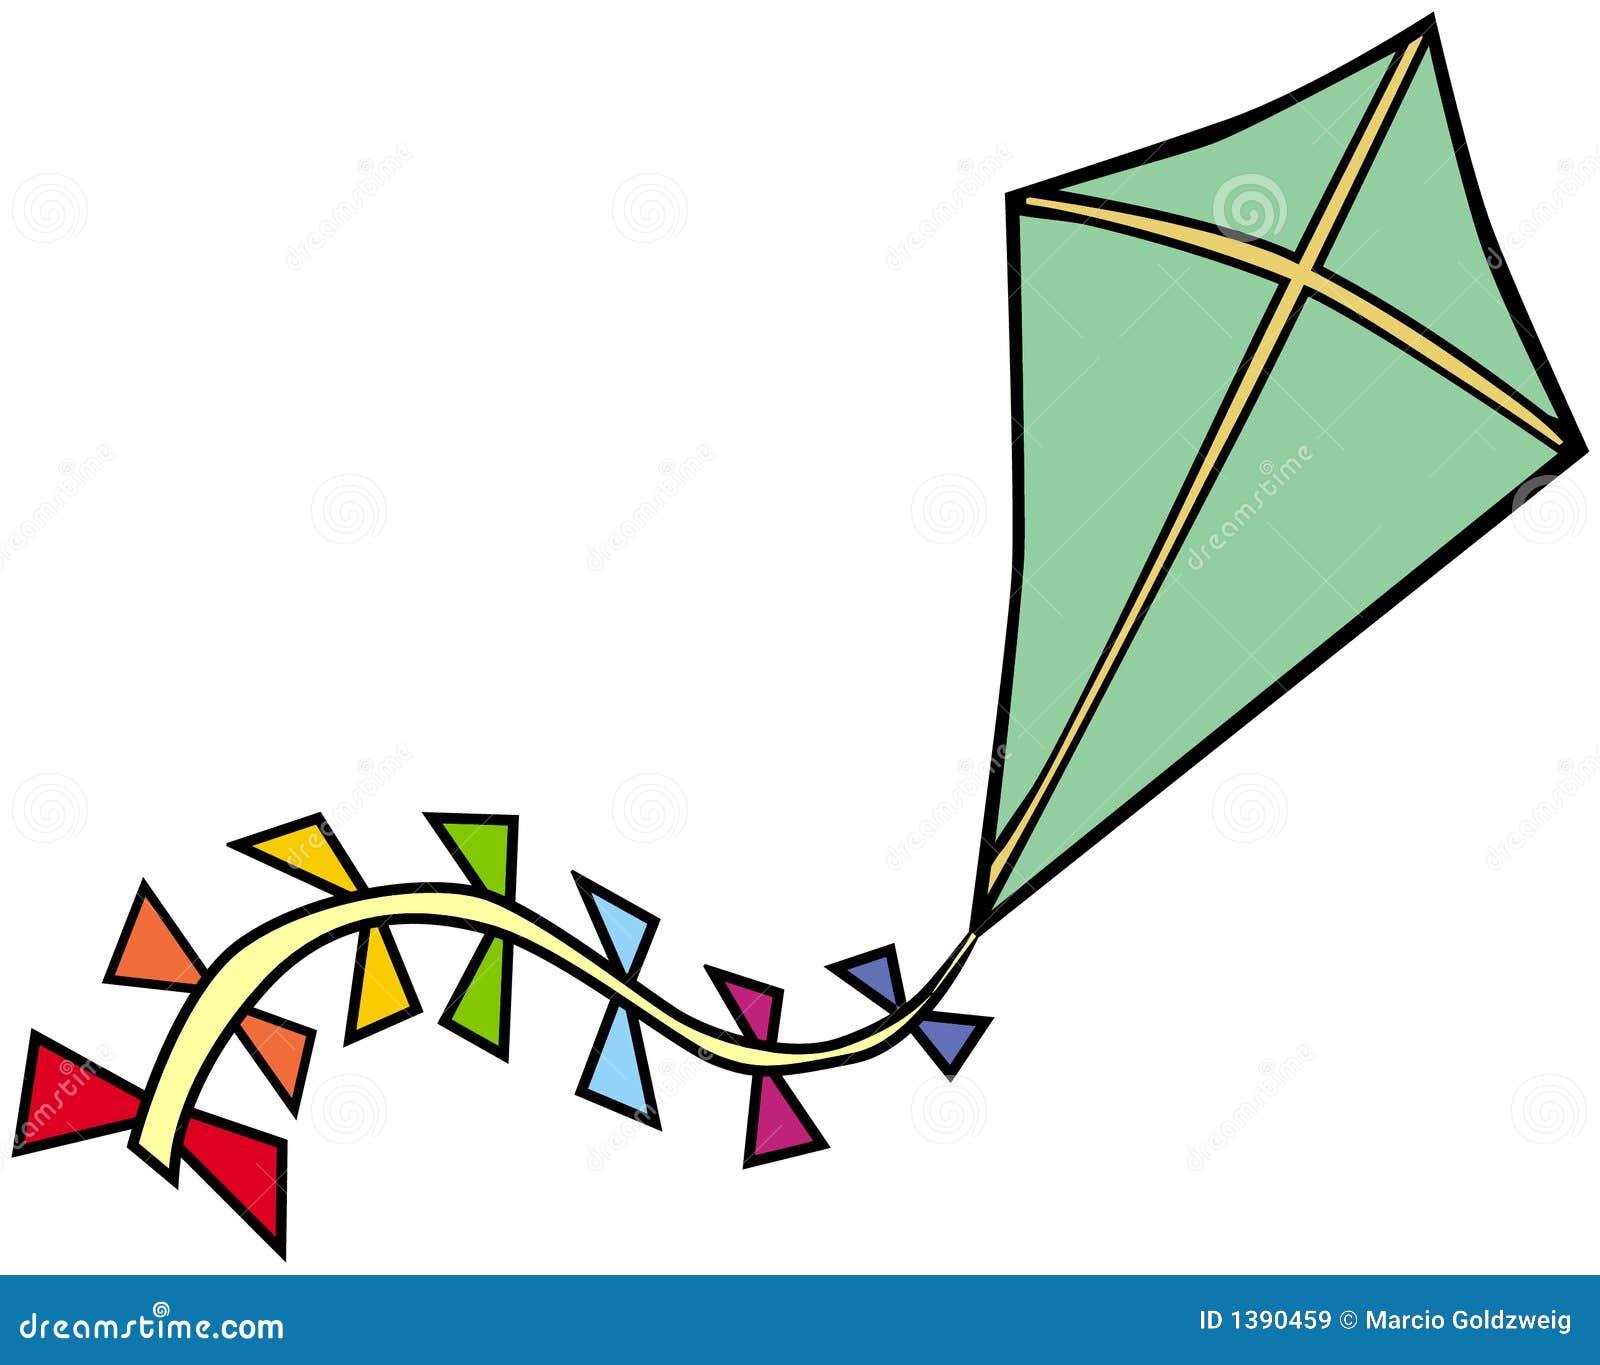 Line Art Kite : Kite royalty free stock images image